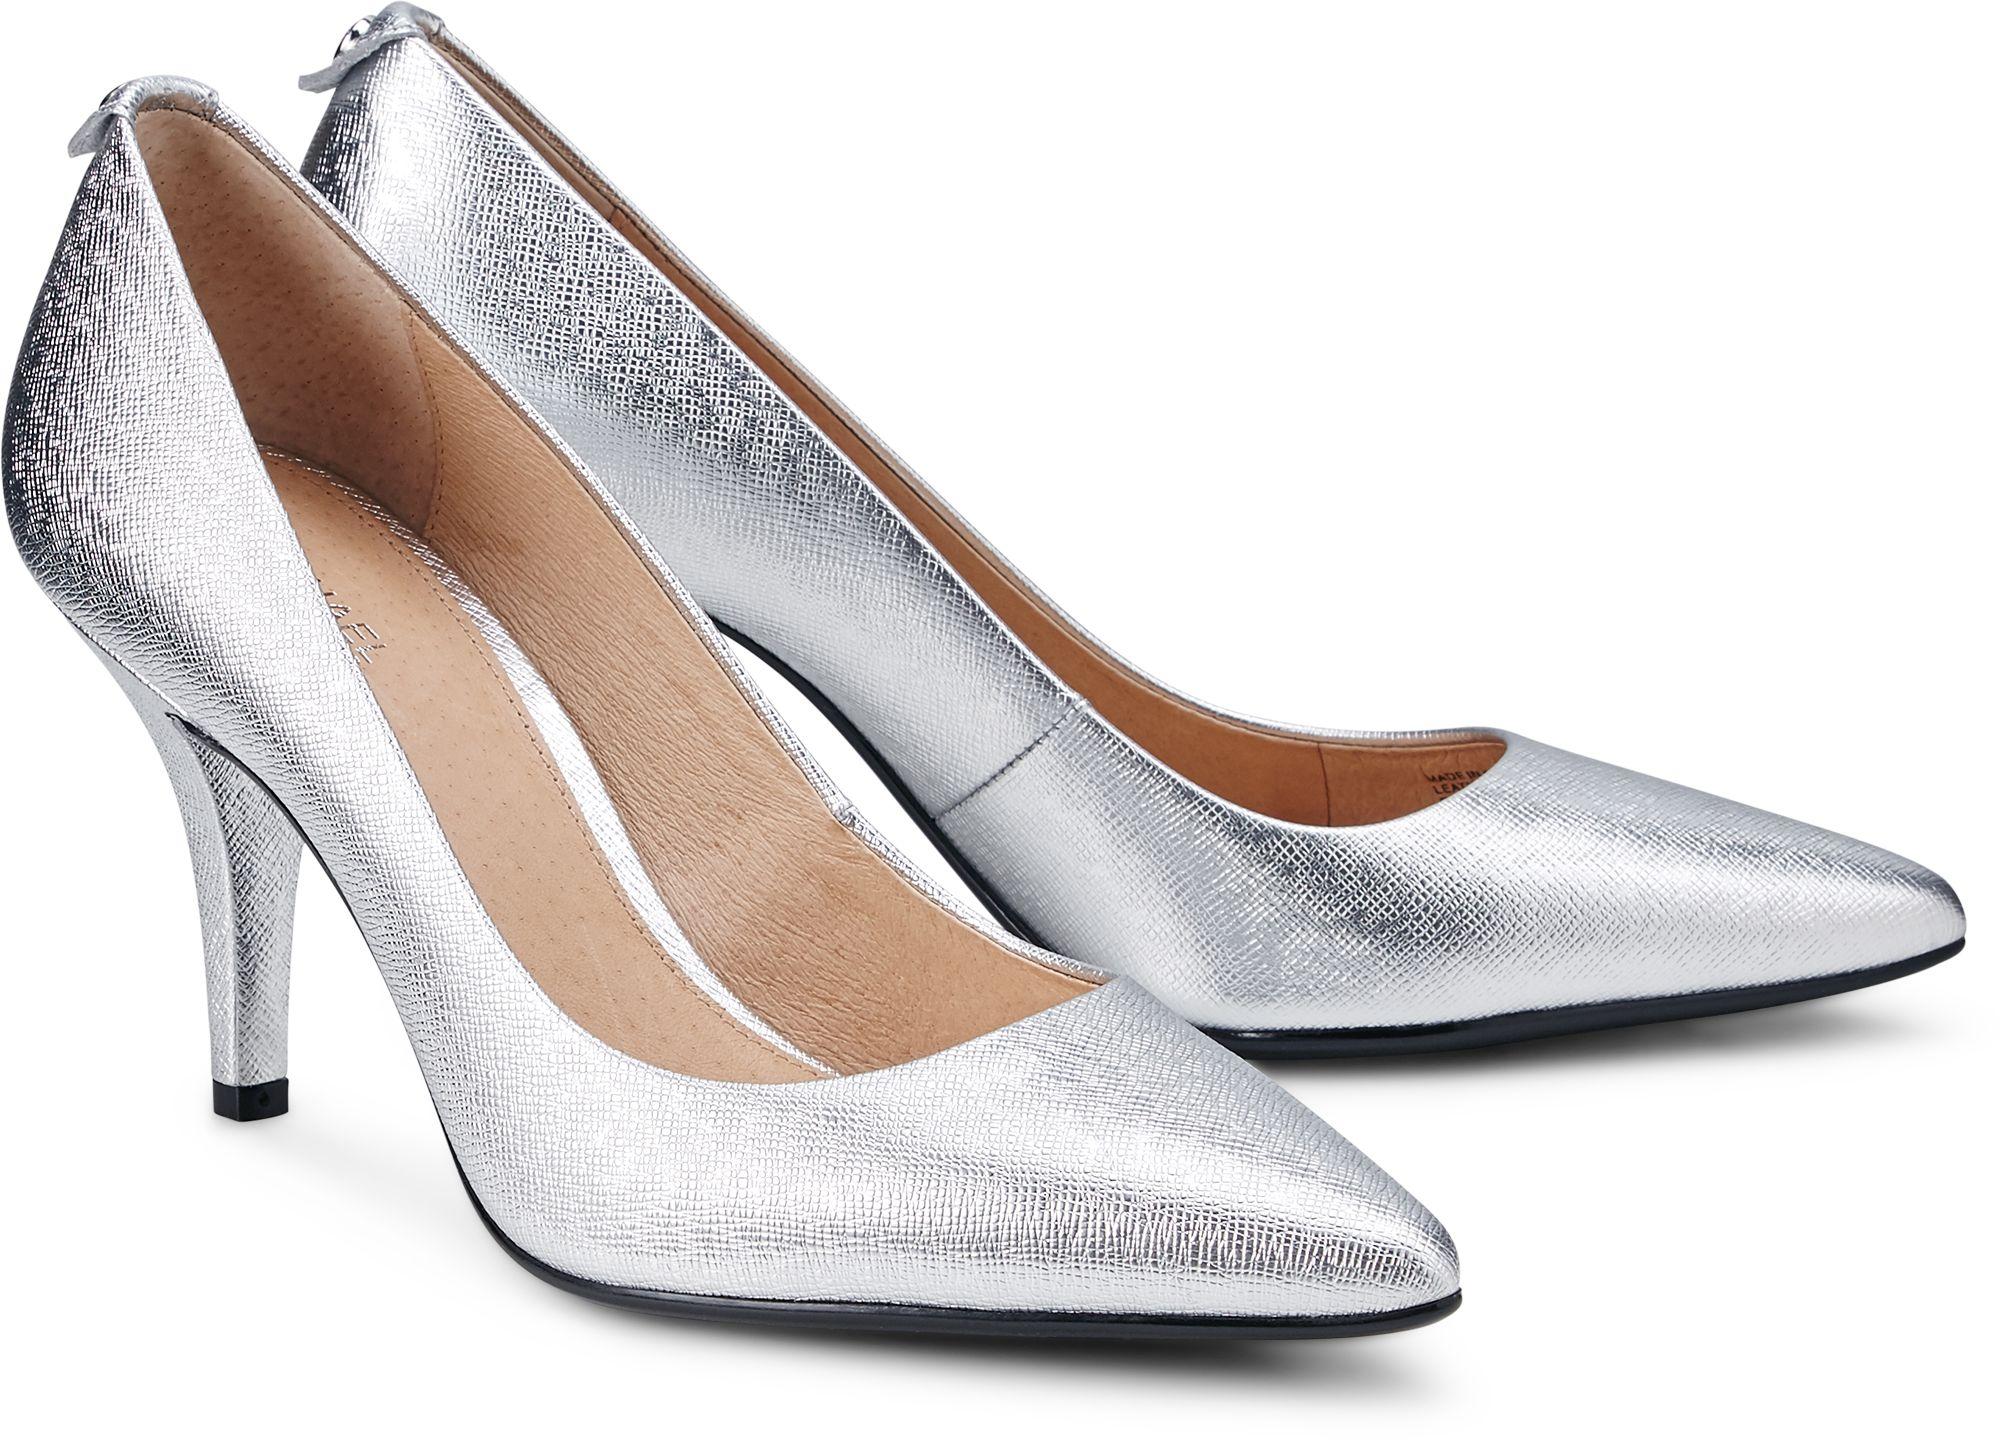 Details zu FRANCO Martini High Heel Sandalen Schuhe Damen Plateau sandalette Gr. 40